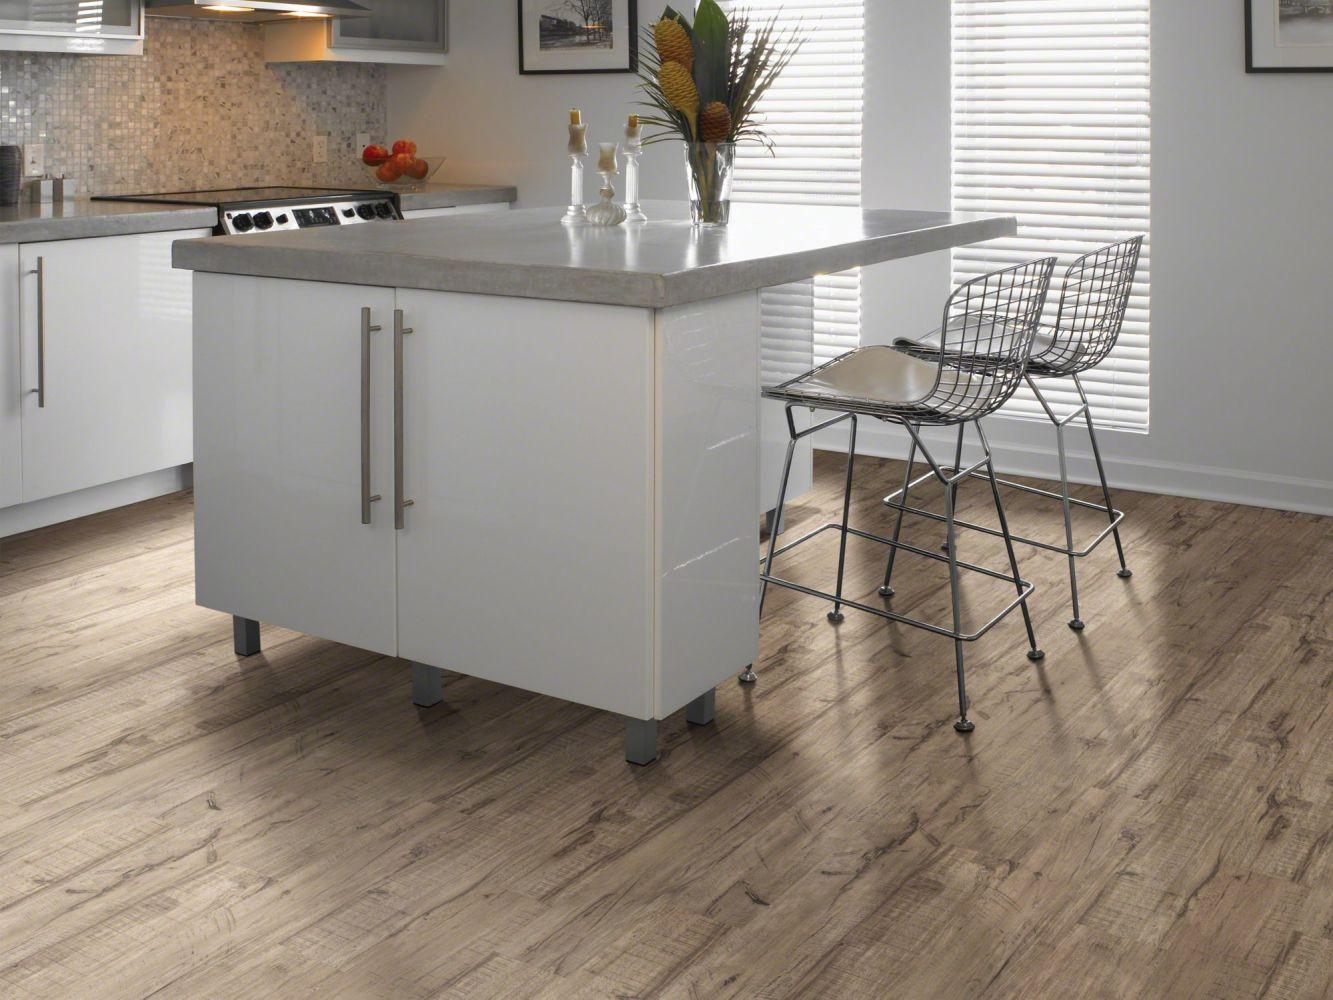 Shaw Floors Nfa HS Take It Easy Sagebrush 00542_VH509